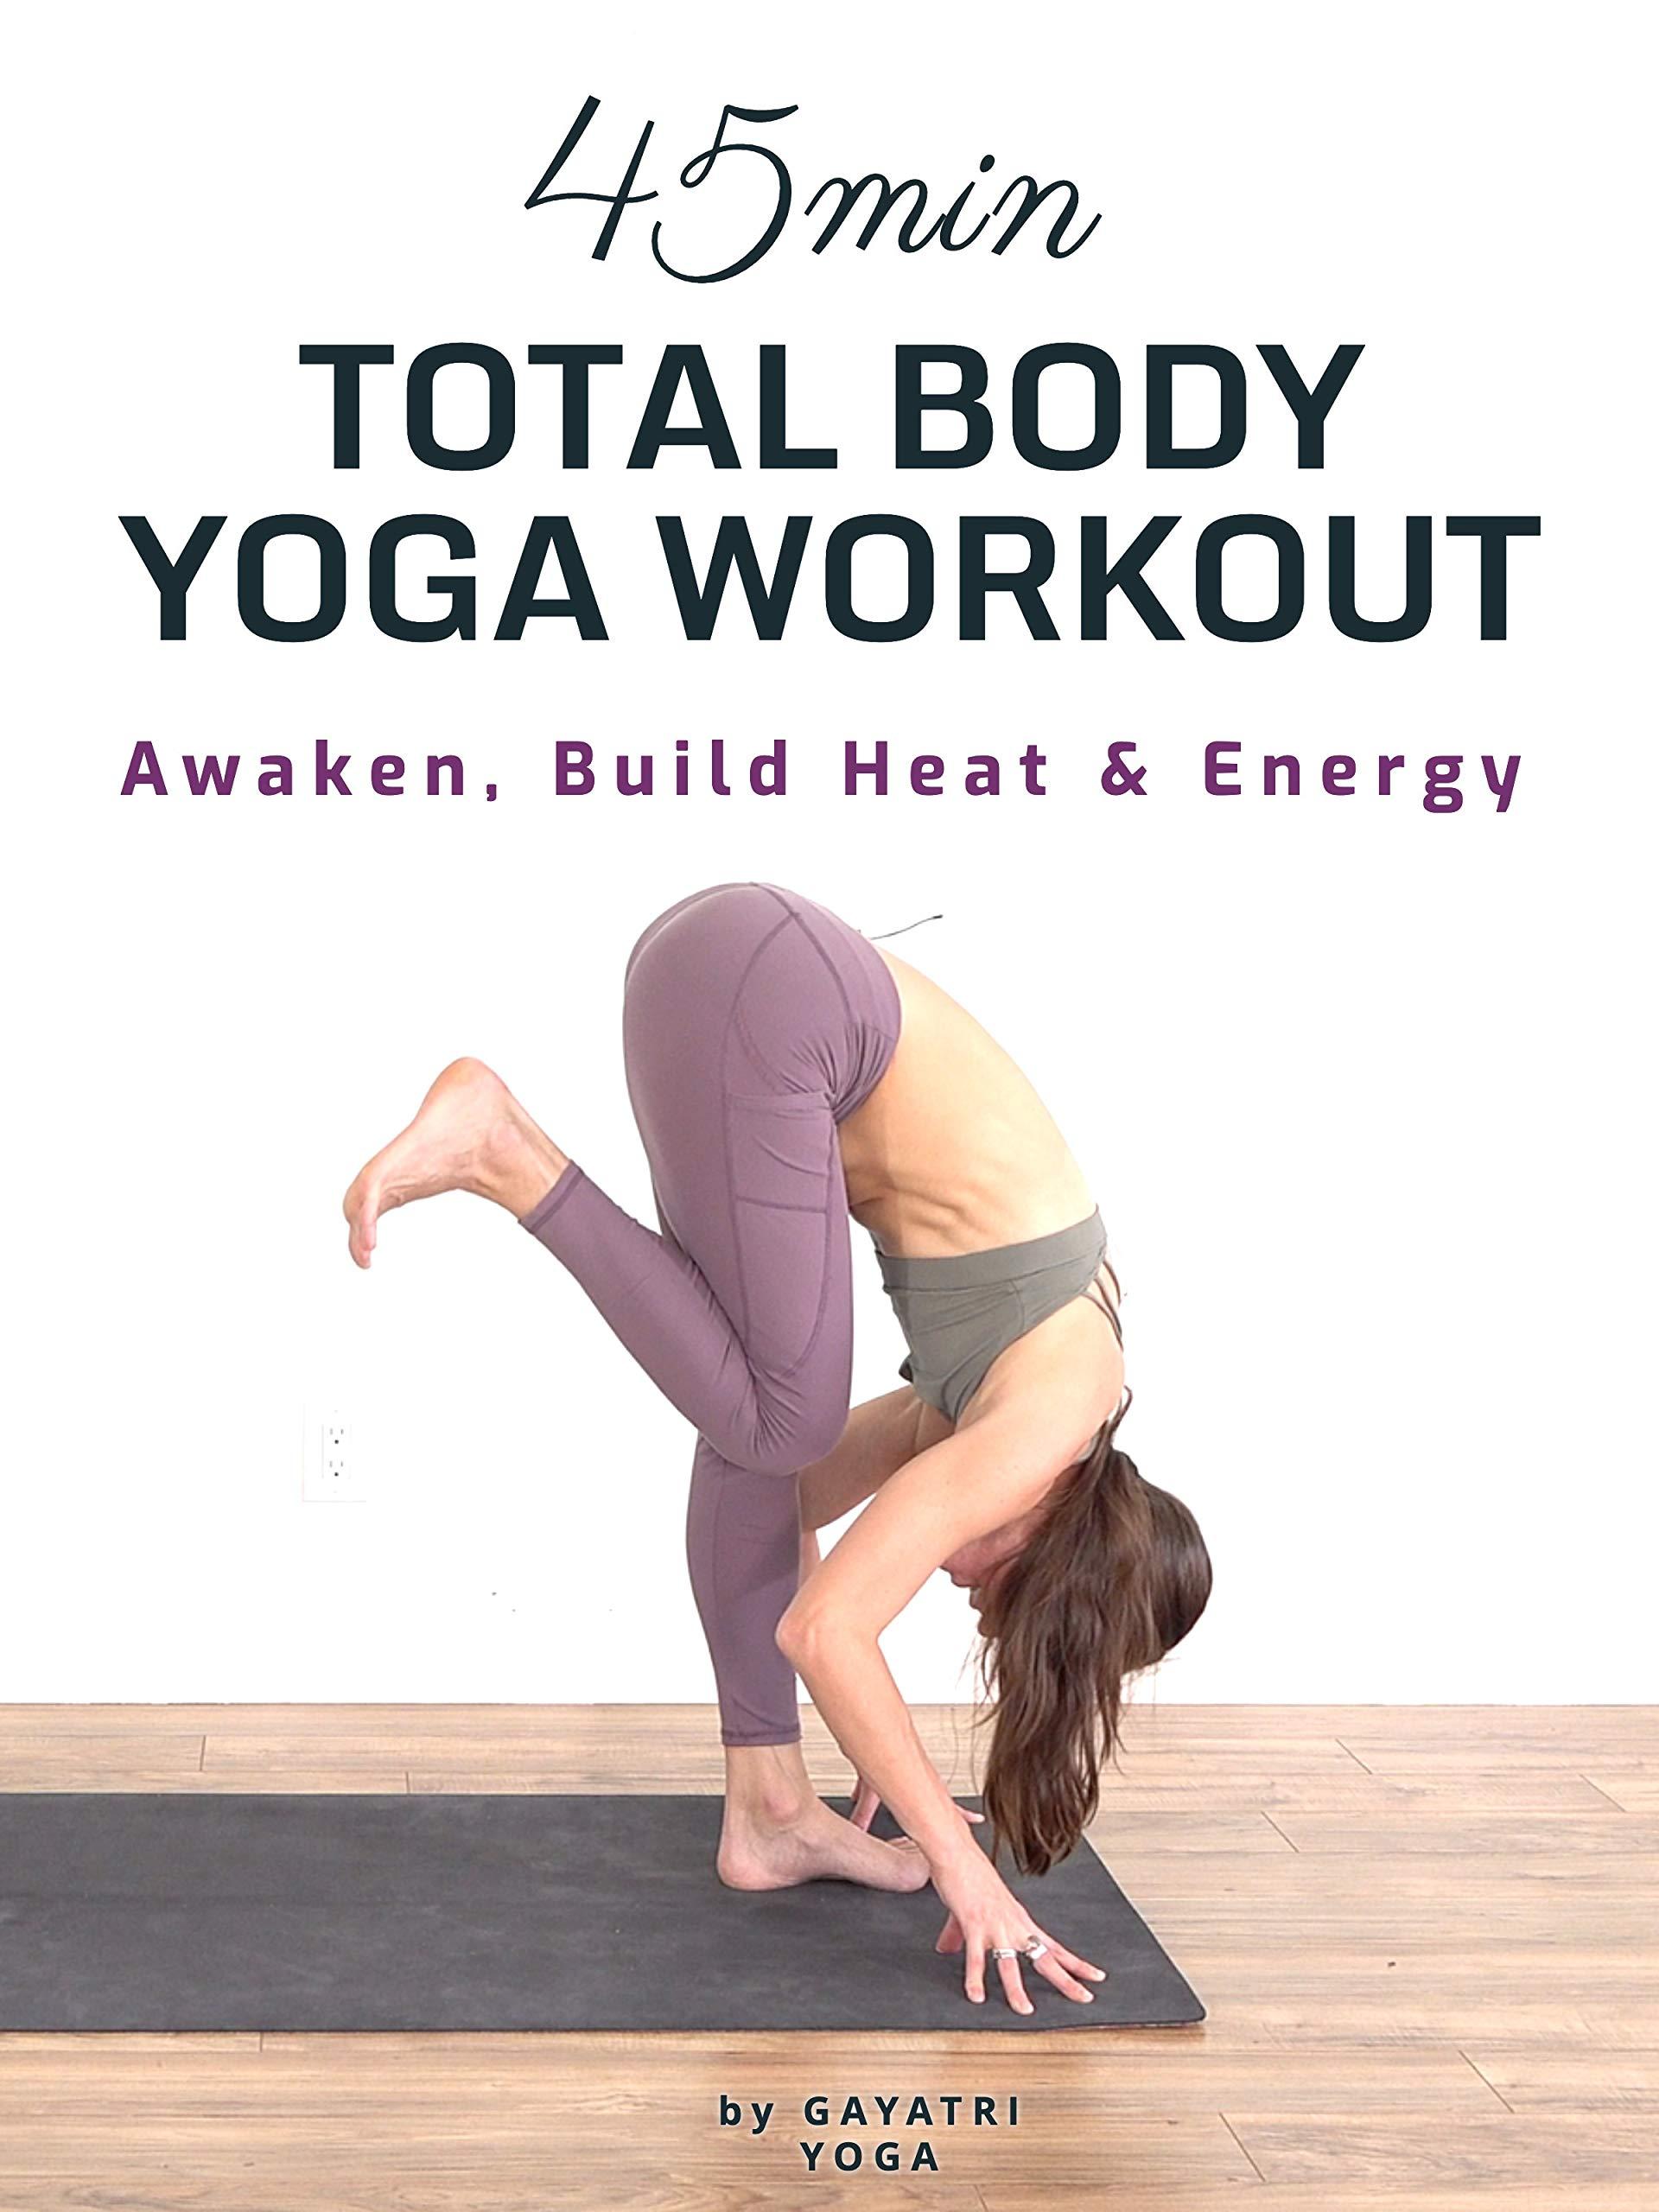 45 Min Total Body Yoga Workout - Awaken, Build Heat & Energy | Gayatri Yoga